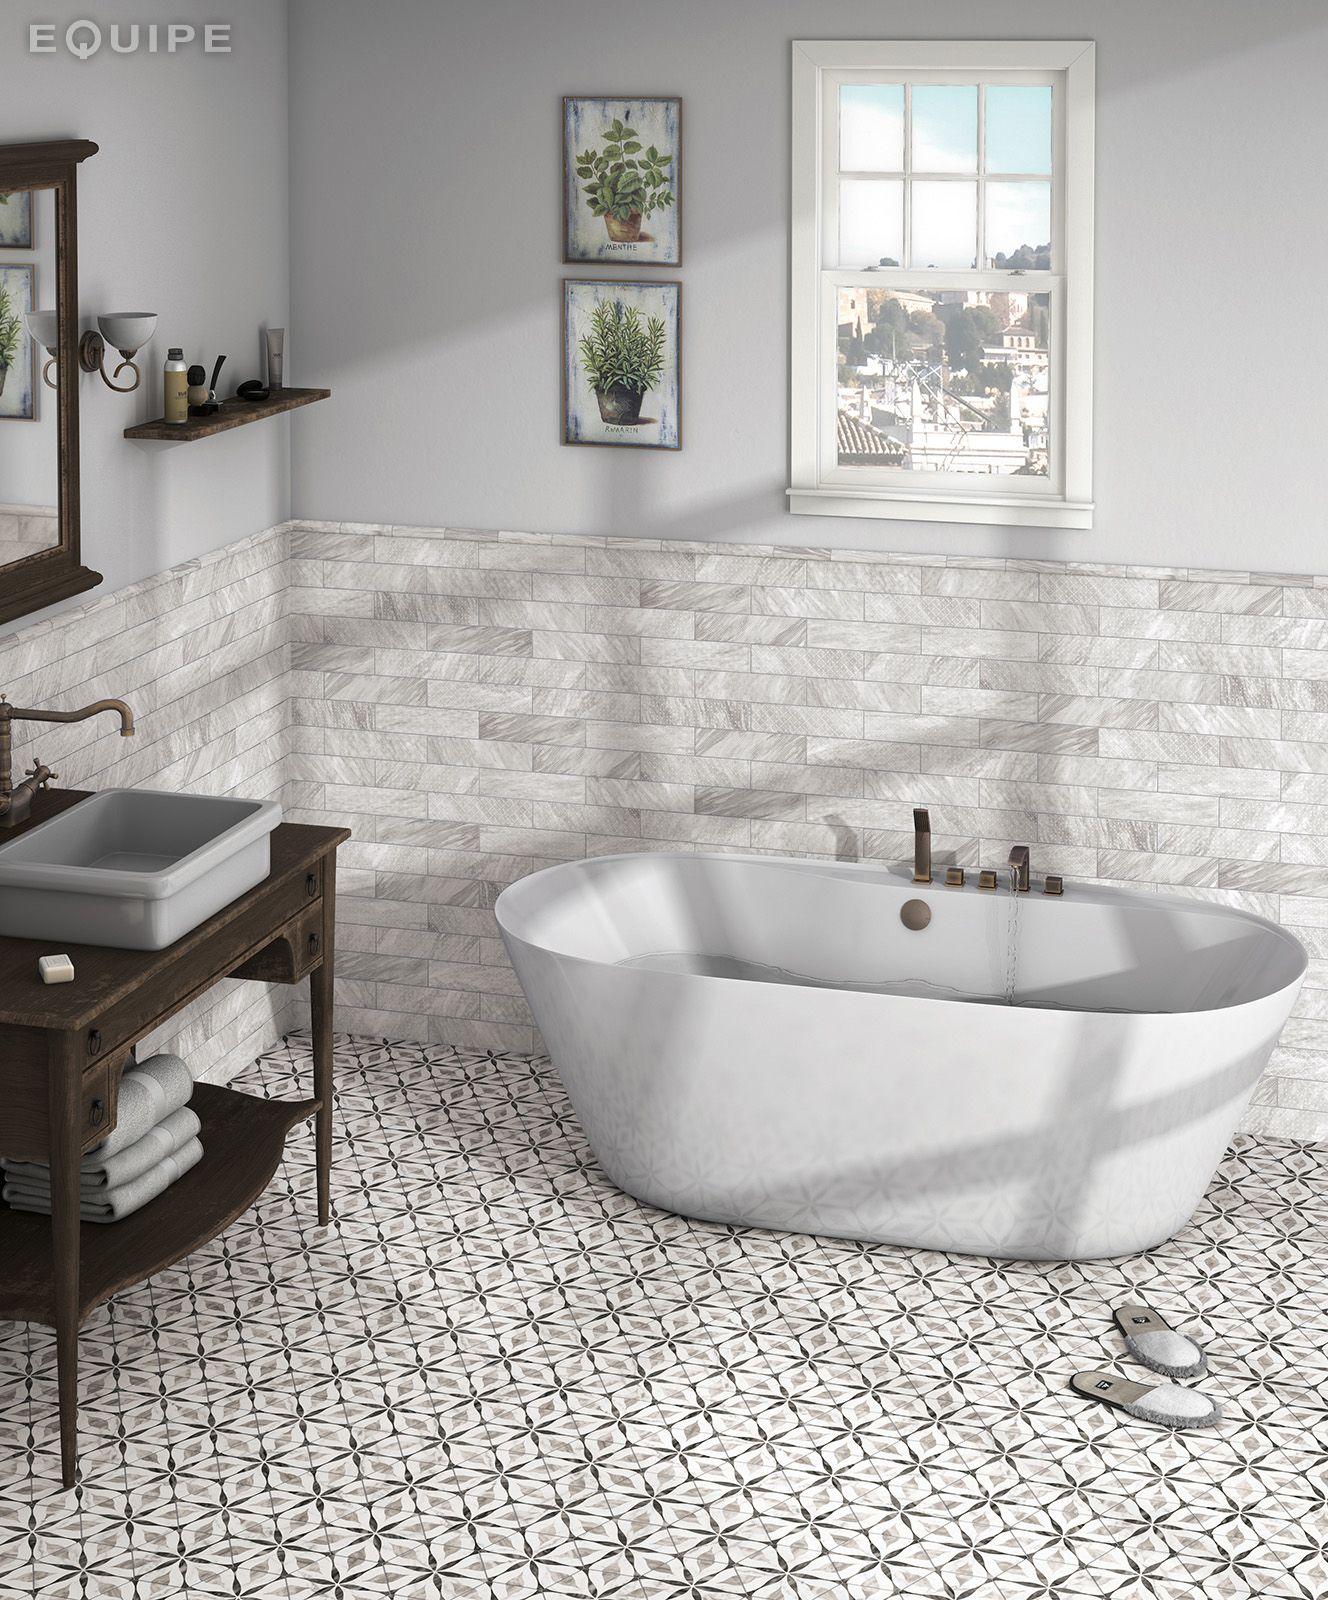 Bardiglio Range by Equipe Ceramicas. | Pannónia tiling | Pinterest ...